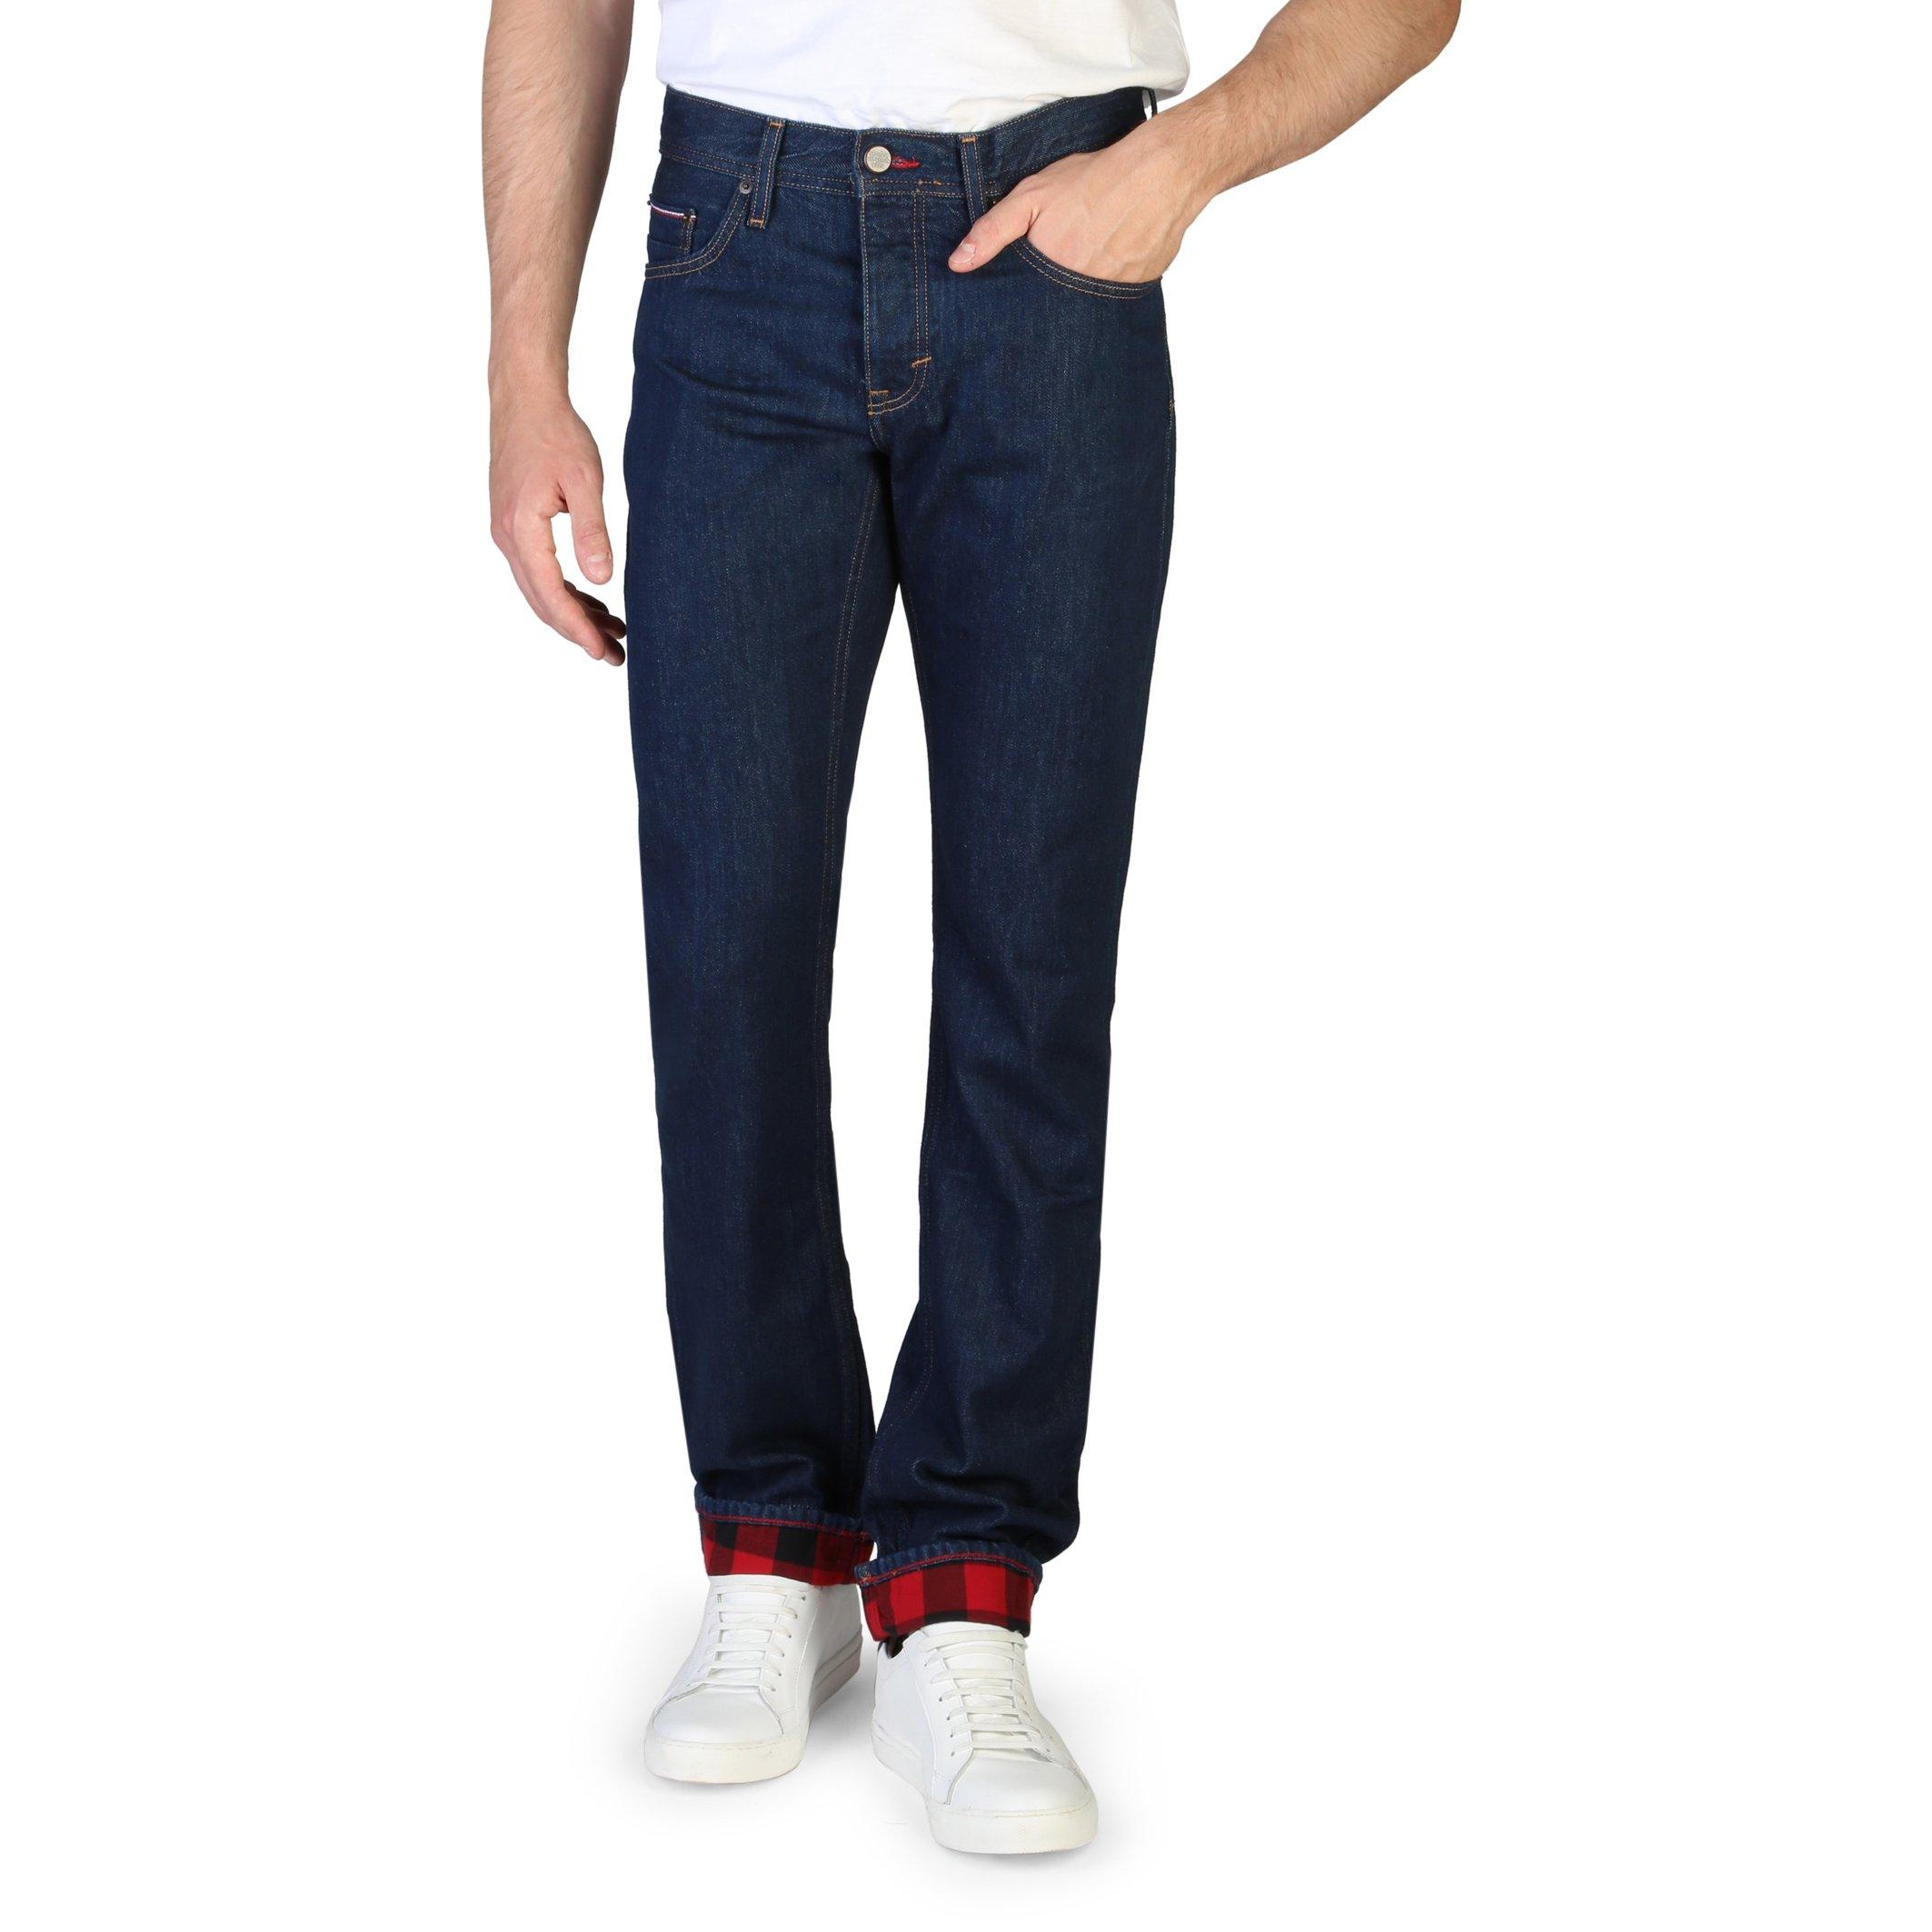 Tommy Hilfiger Men's Jeans Blue MW0MW08115 - blue-1 38